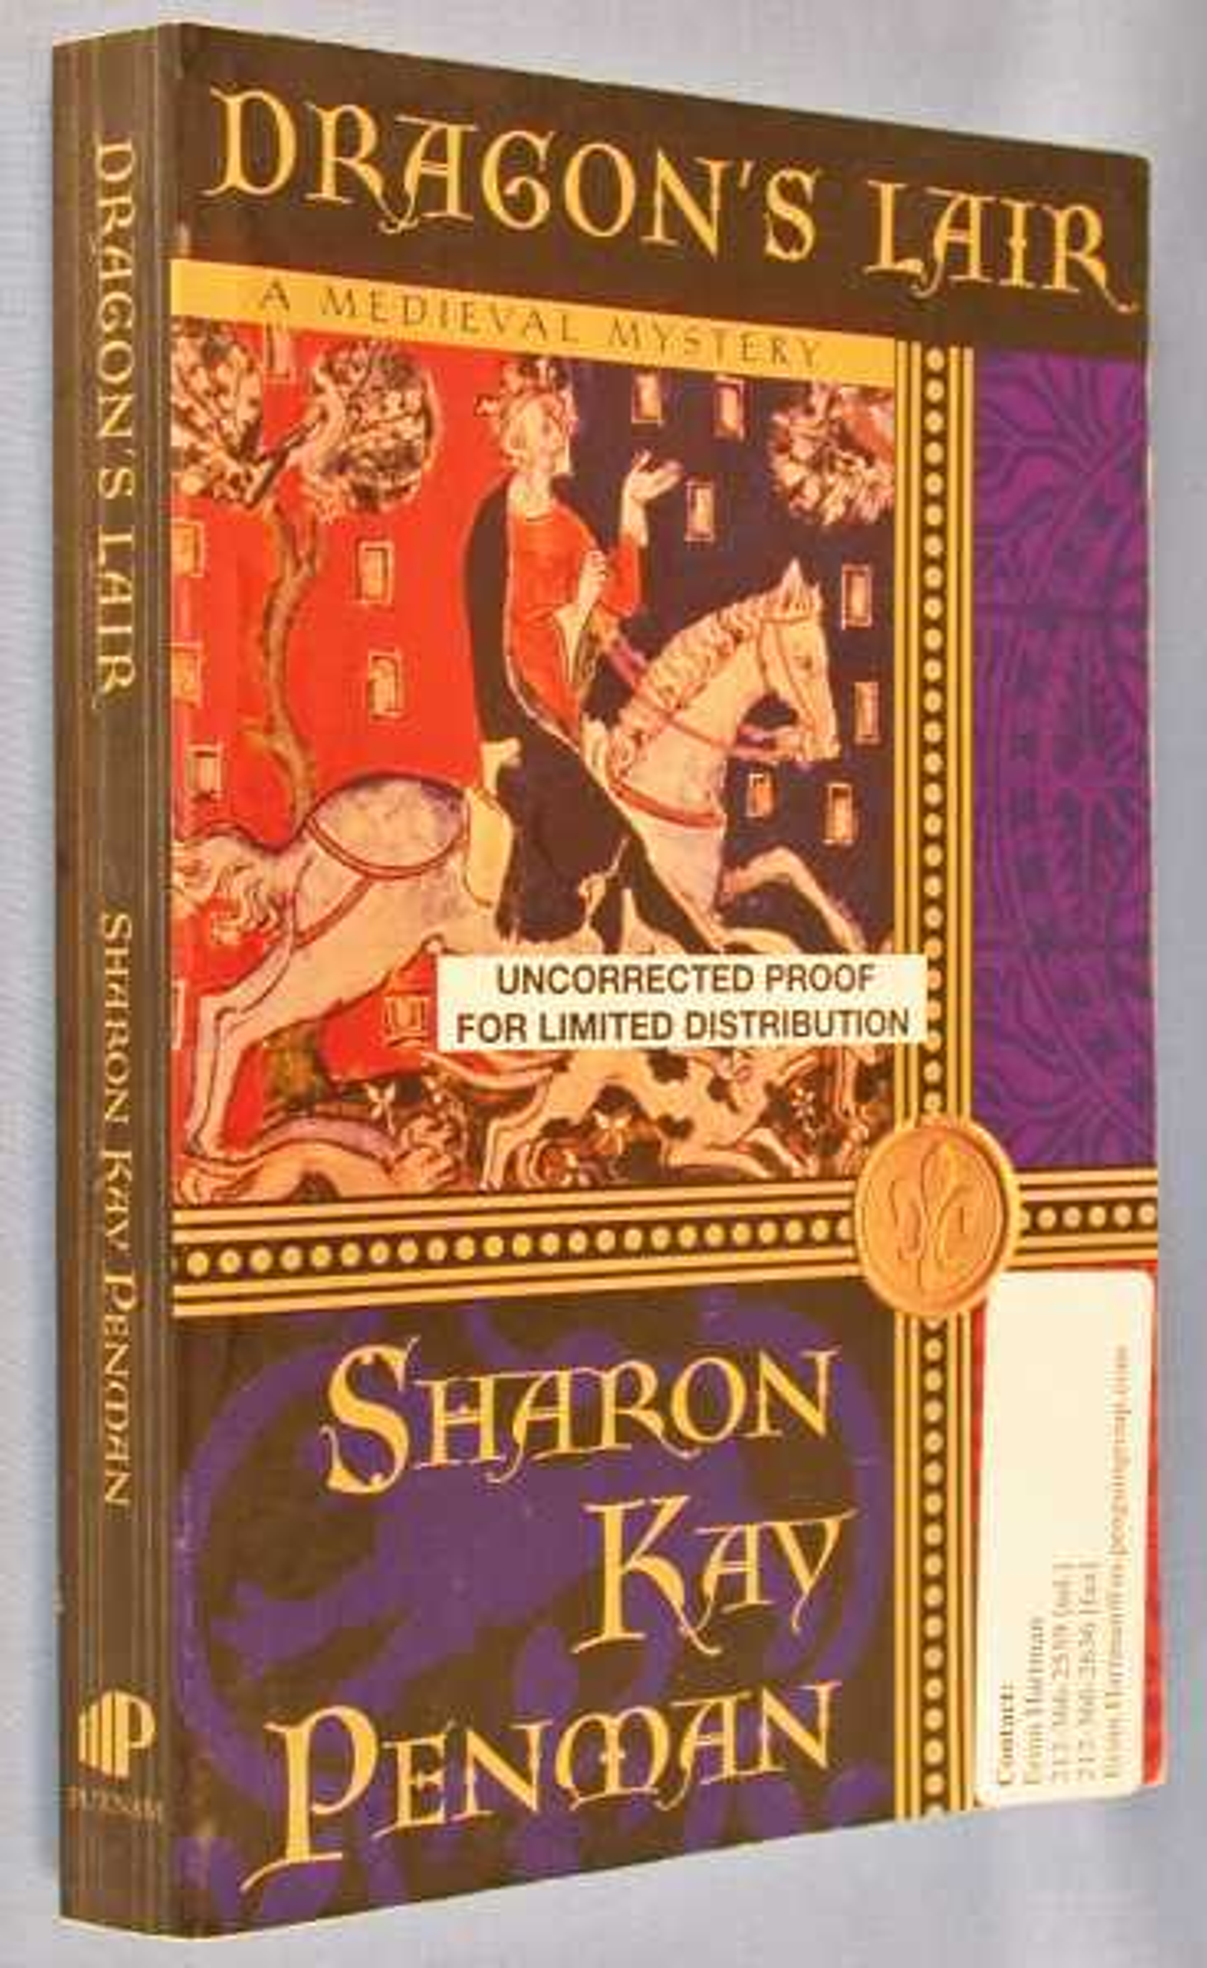 Dragon's Lair: A Medieval Mystery, Penman, Sharon Kay